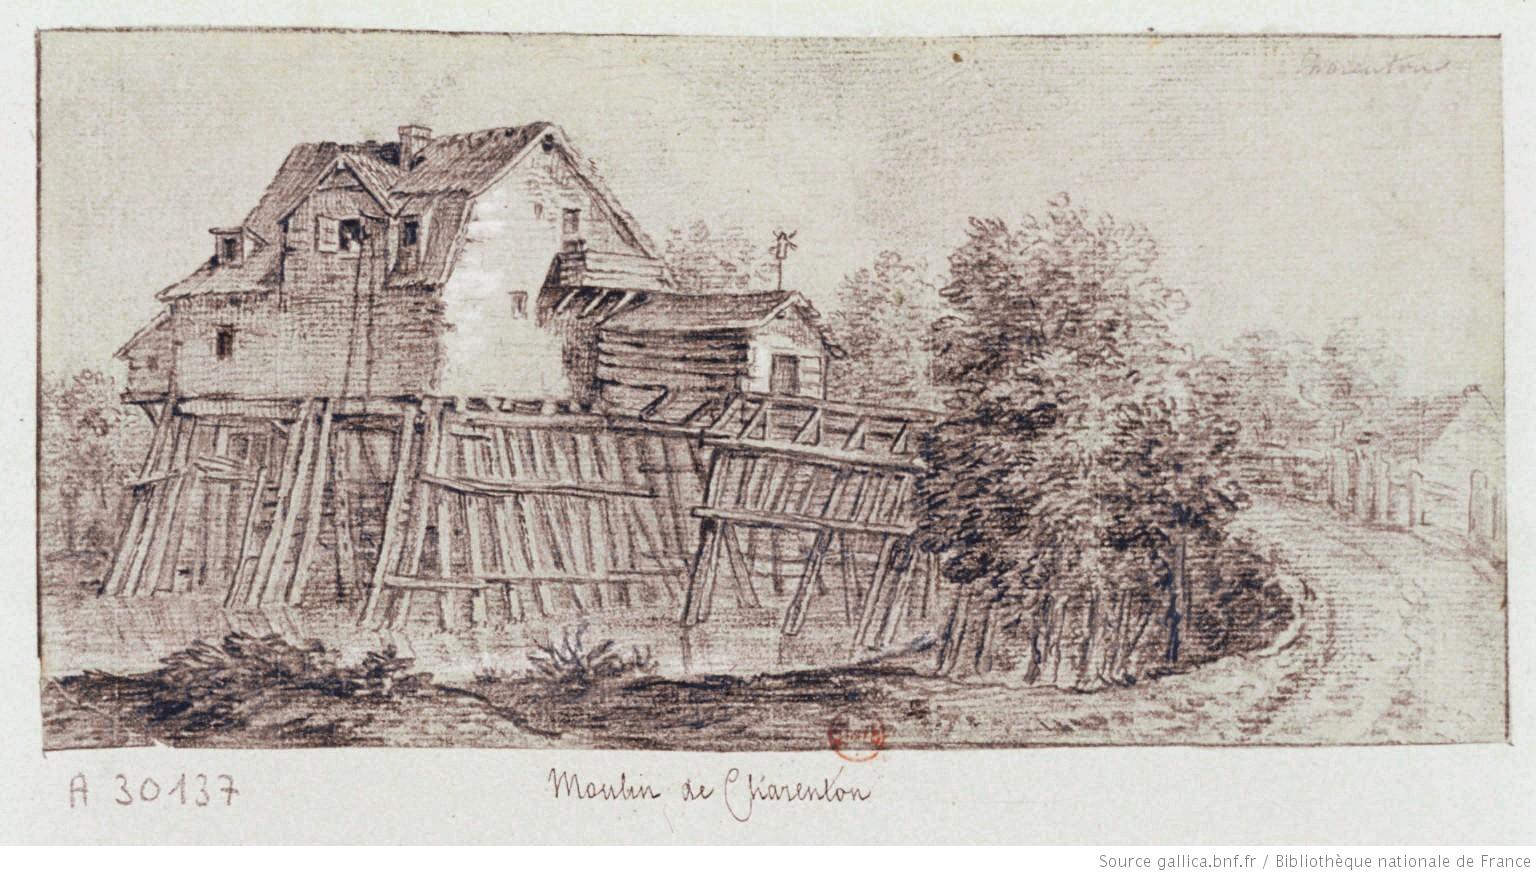 moulin_de_charenton_-_dessin__btv1b77401053